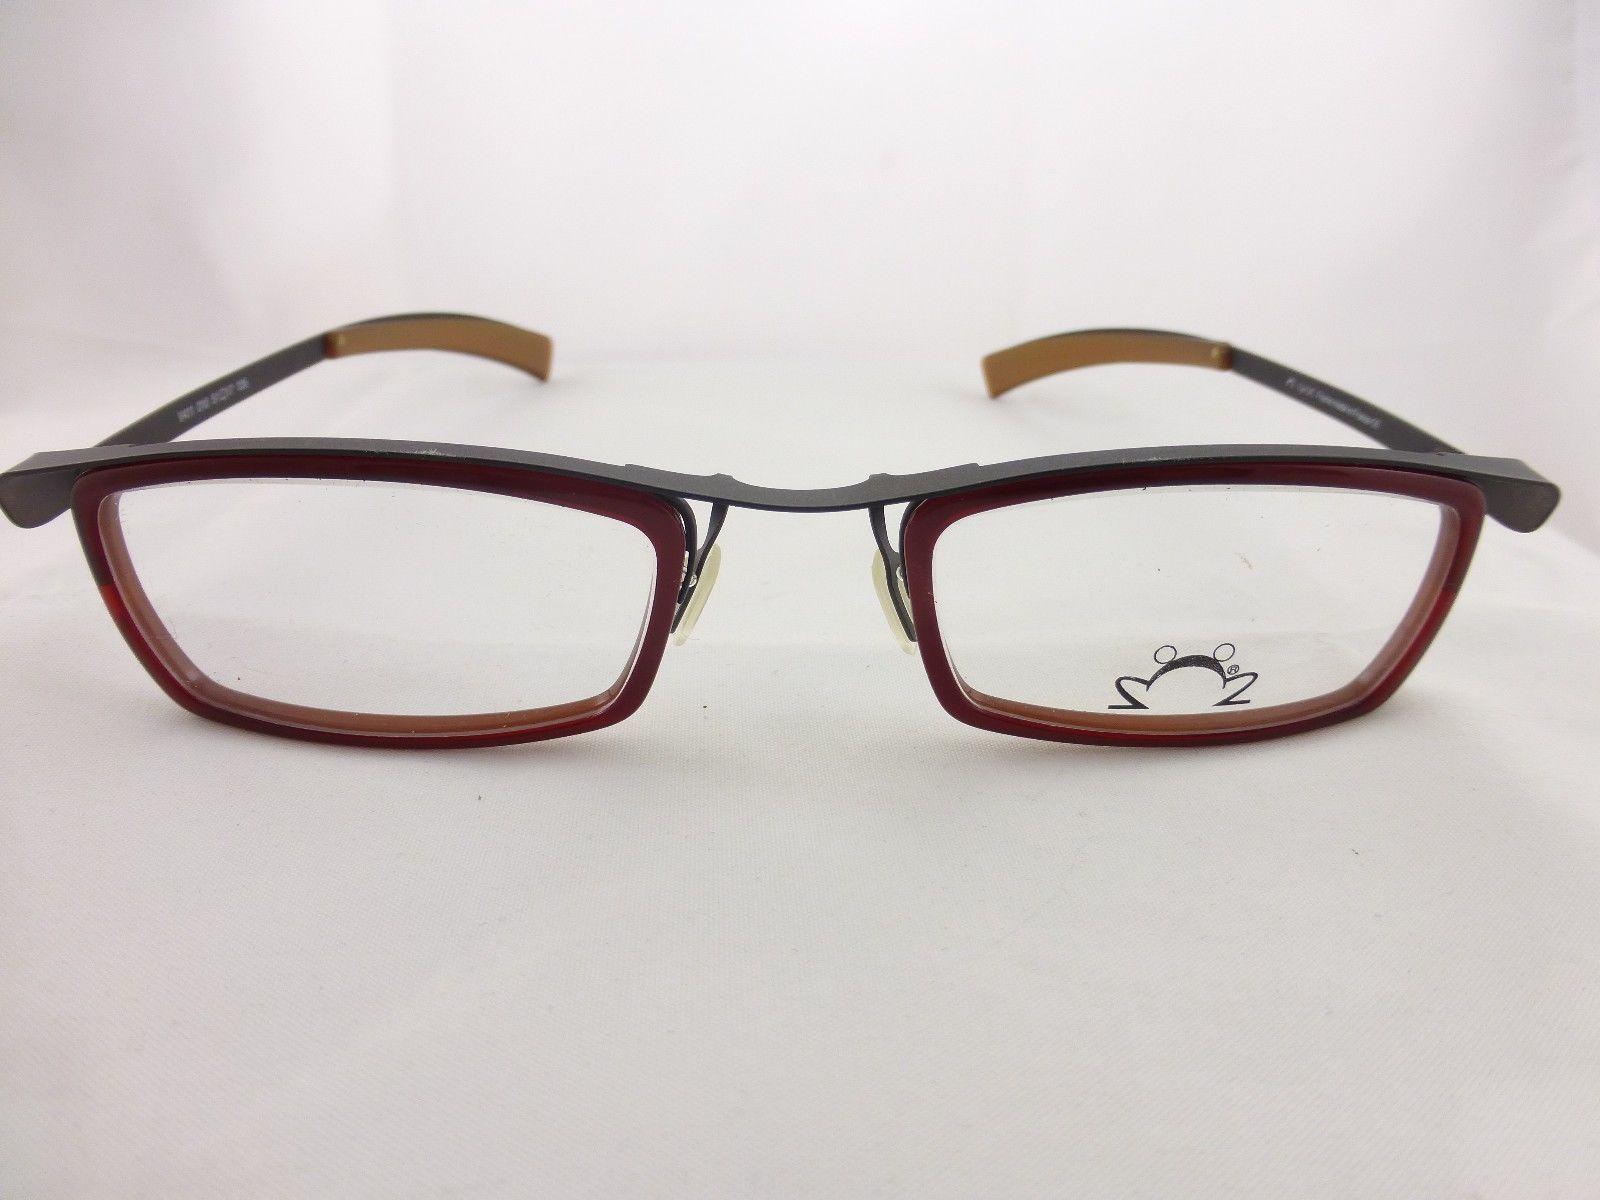 Glasses Frame Made In France : EYE DC Special eyeglasses frame, Red frame, Mod. V411 Made ...